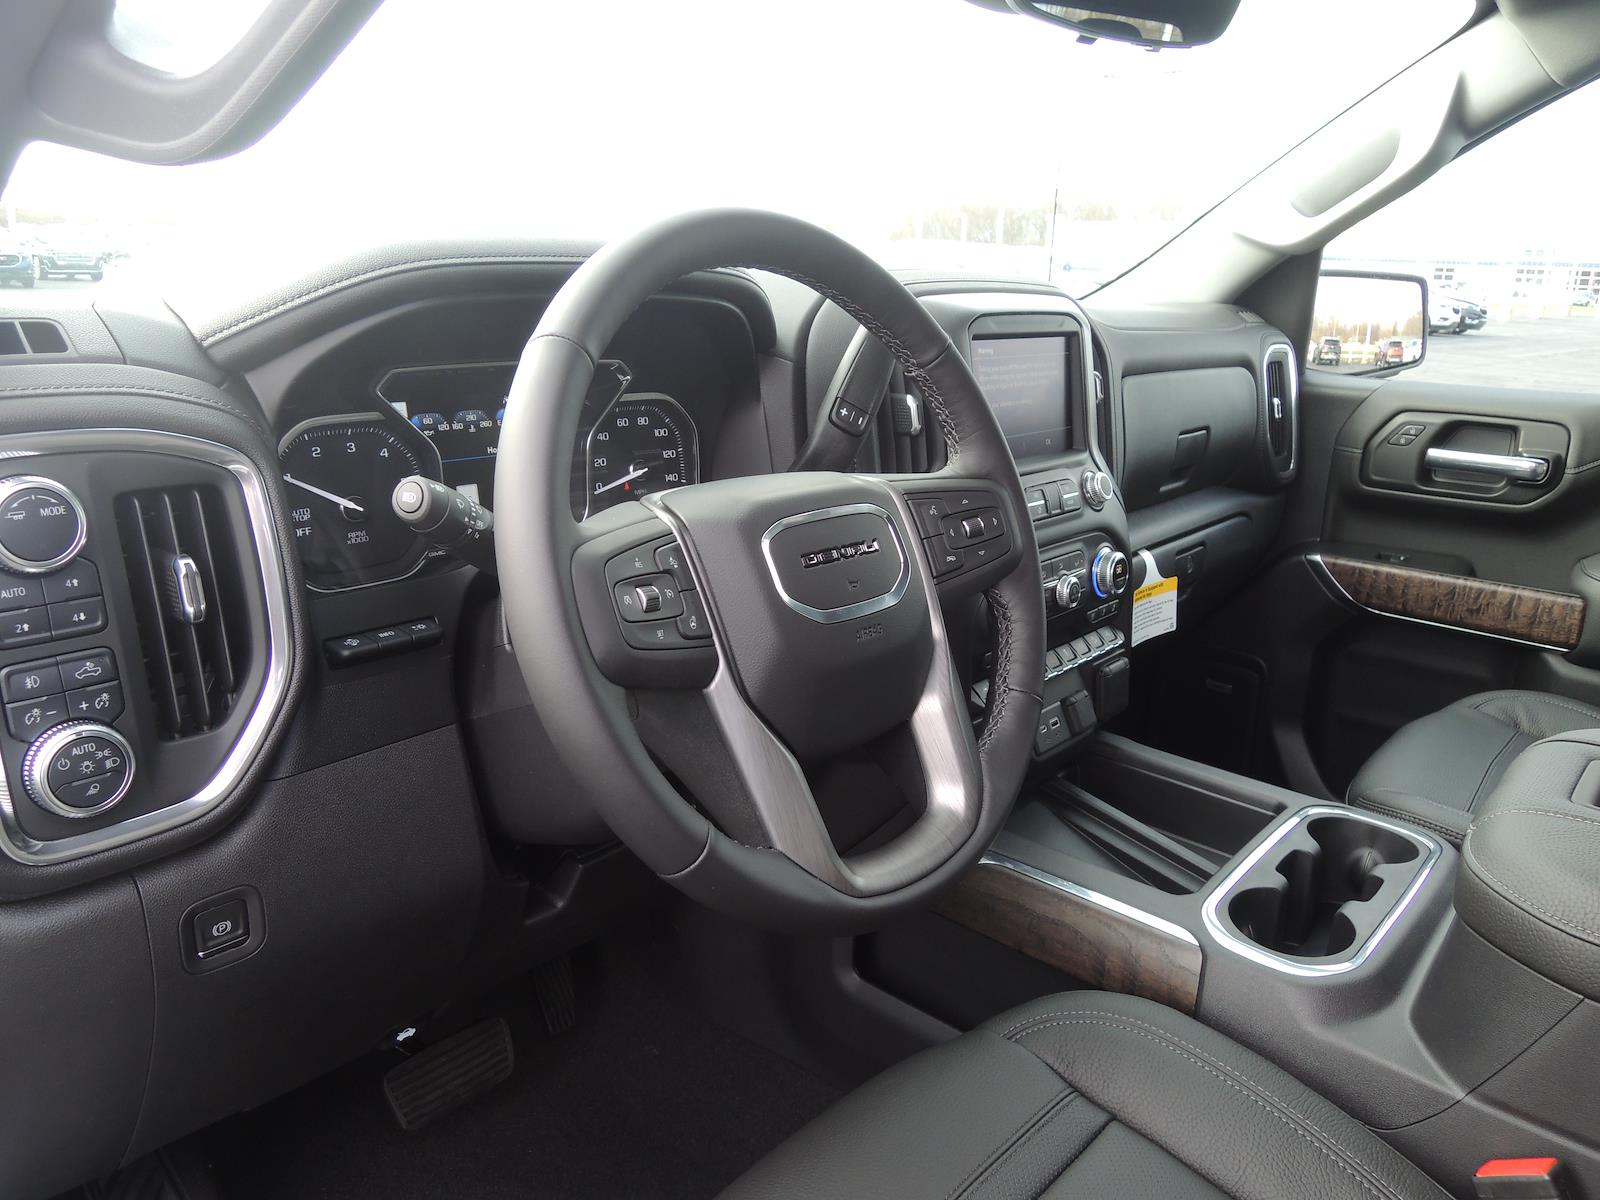 2021 GMC Sierra 1500 Crew Cab 4x4, Pickup #MT434 - photo 17